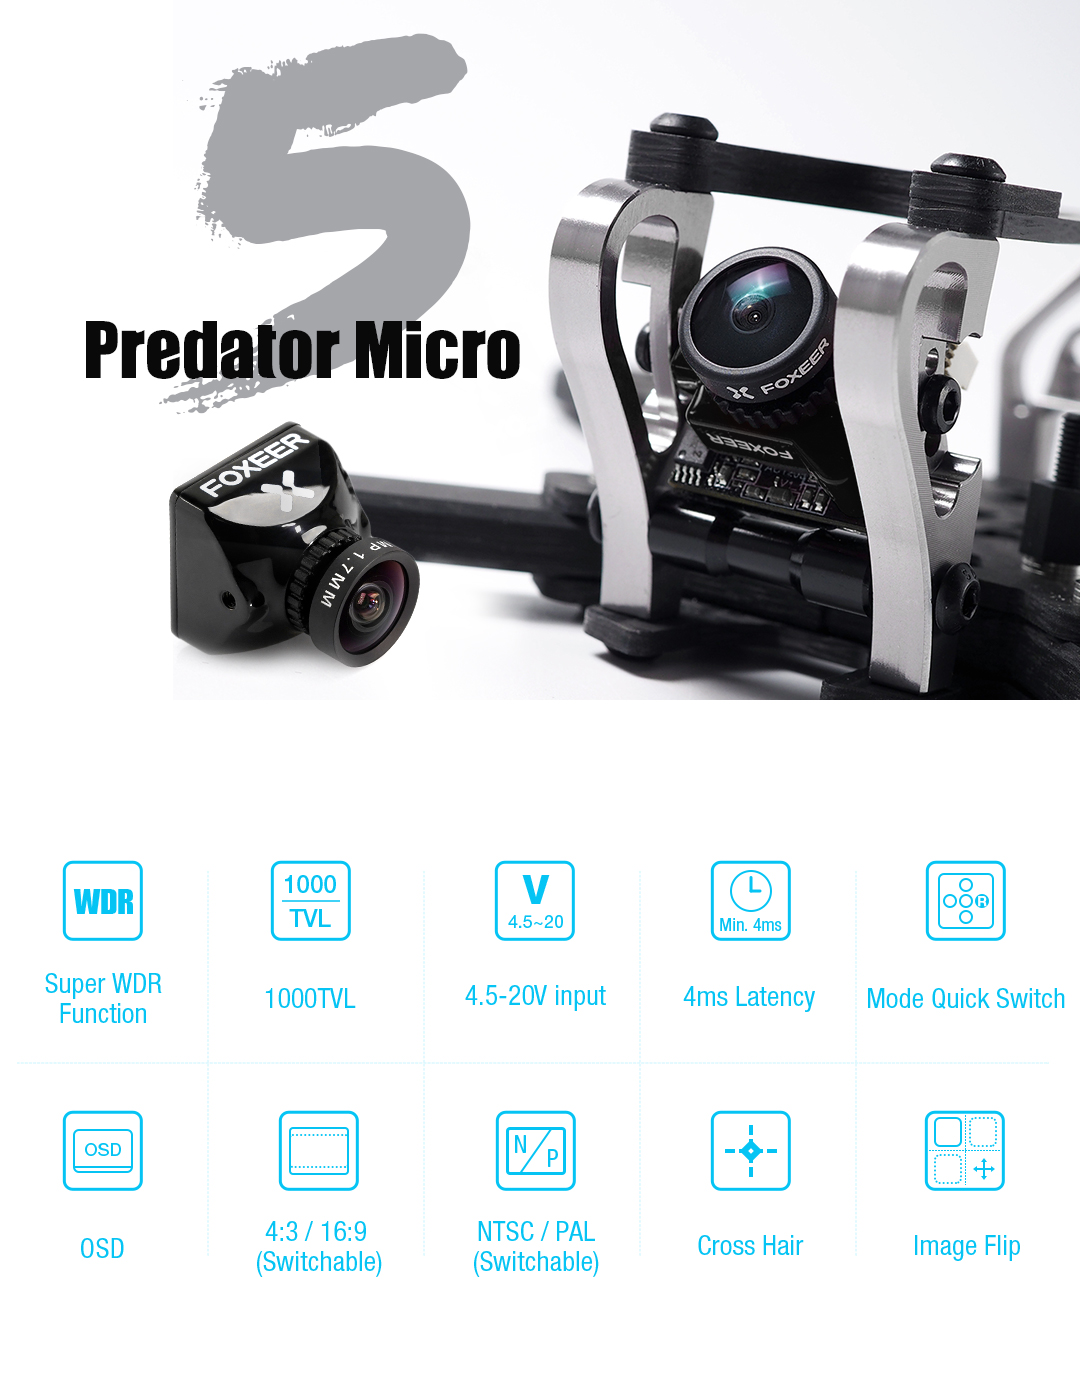 foxeer micro predator 5 racing fpv camera m8 lens 4ms latency super wdr australia description mantisfpv